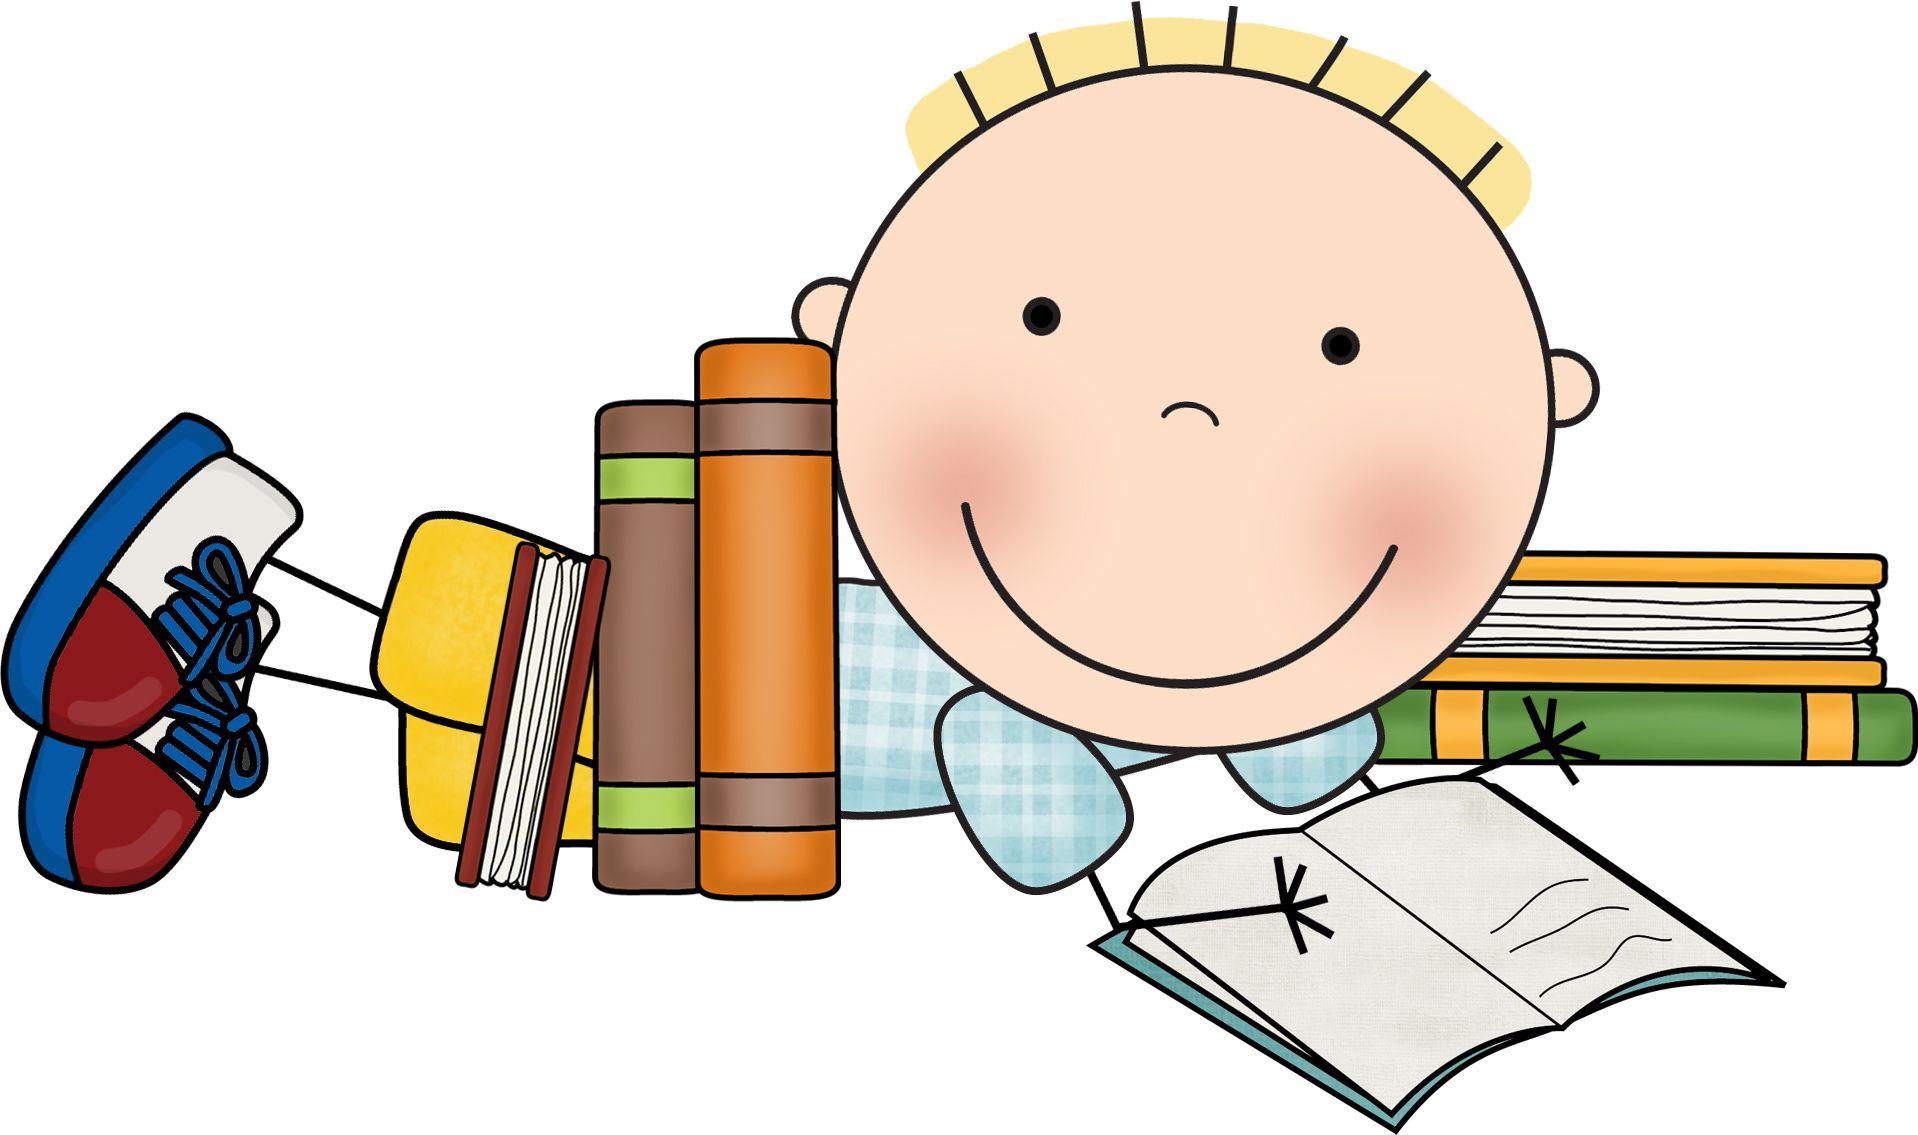 reading literacy clip art 1719218 jpg 1918 1135 behavior rules rh pinterest com literary clip art literacy clipart free